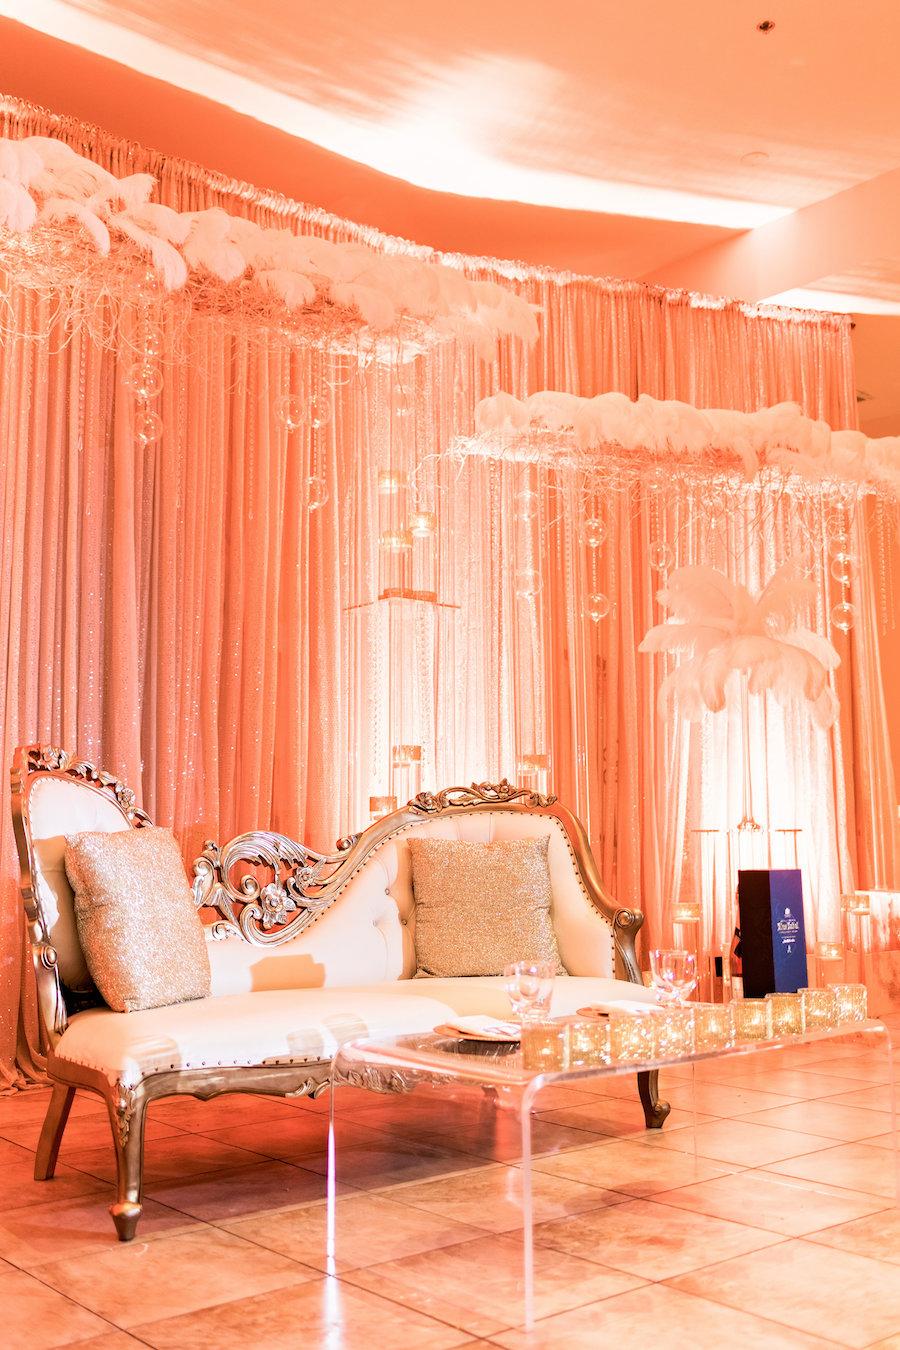 Cindy-and-Glenn_wedding_munaluchi_brides-of-color_munaluchi-bride_nigerian-wedding_multicultural-love6.jpg